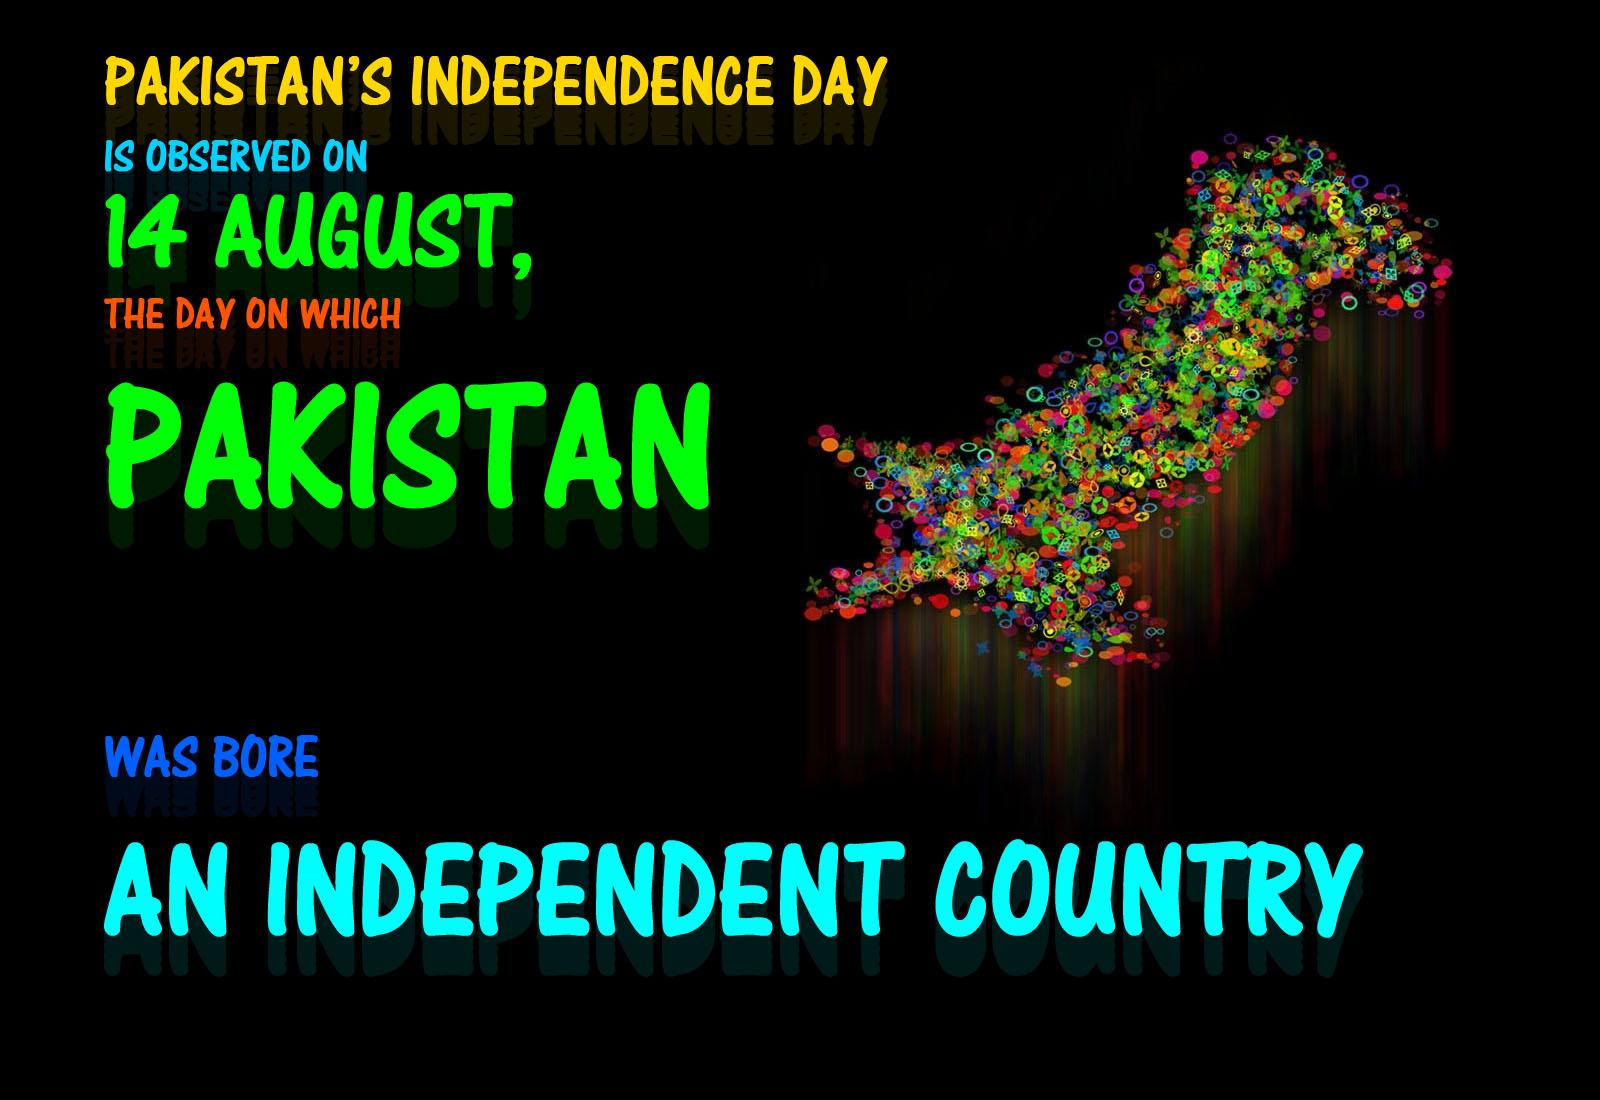 http://3.bp.blogspot.com/-jo-i9OS6ED8/UB6p3Gg6M4I/AAAAAAAASVs/W26tfavi-Gg/s1600/pakistan-independence-day-wallpaper-2012-4.jpg